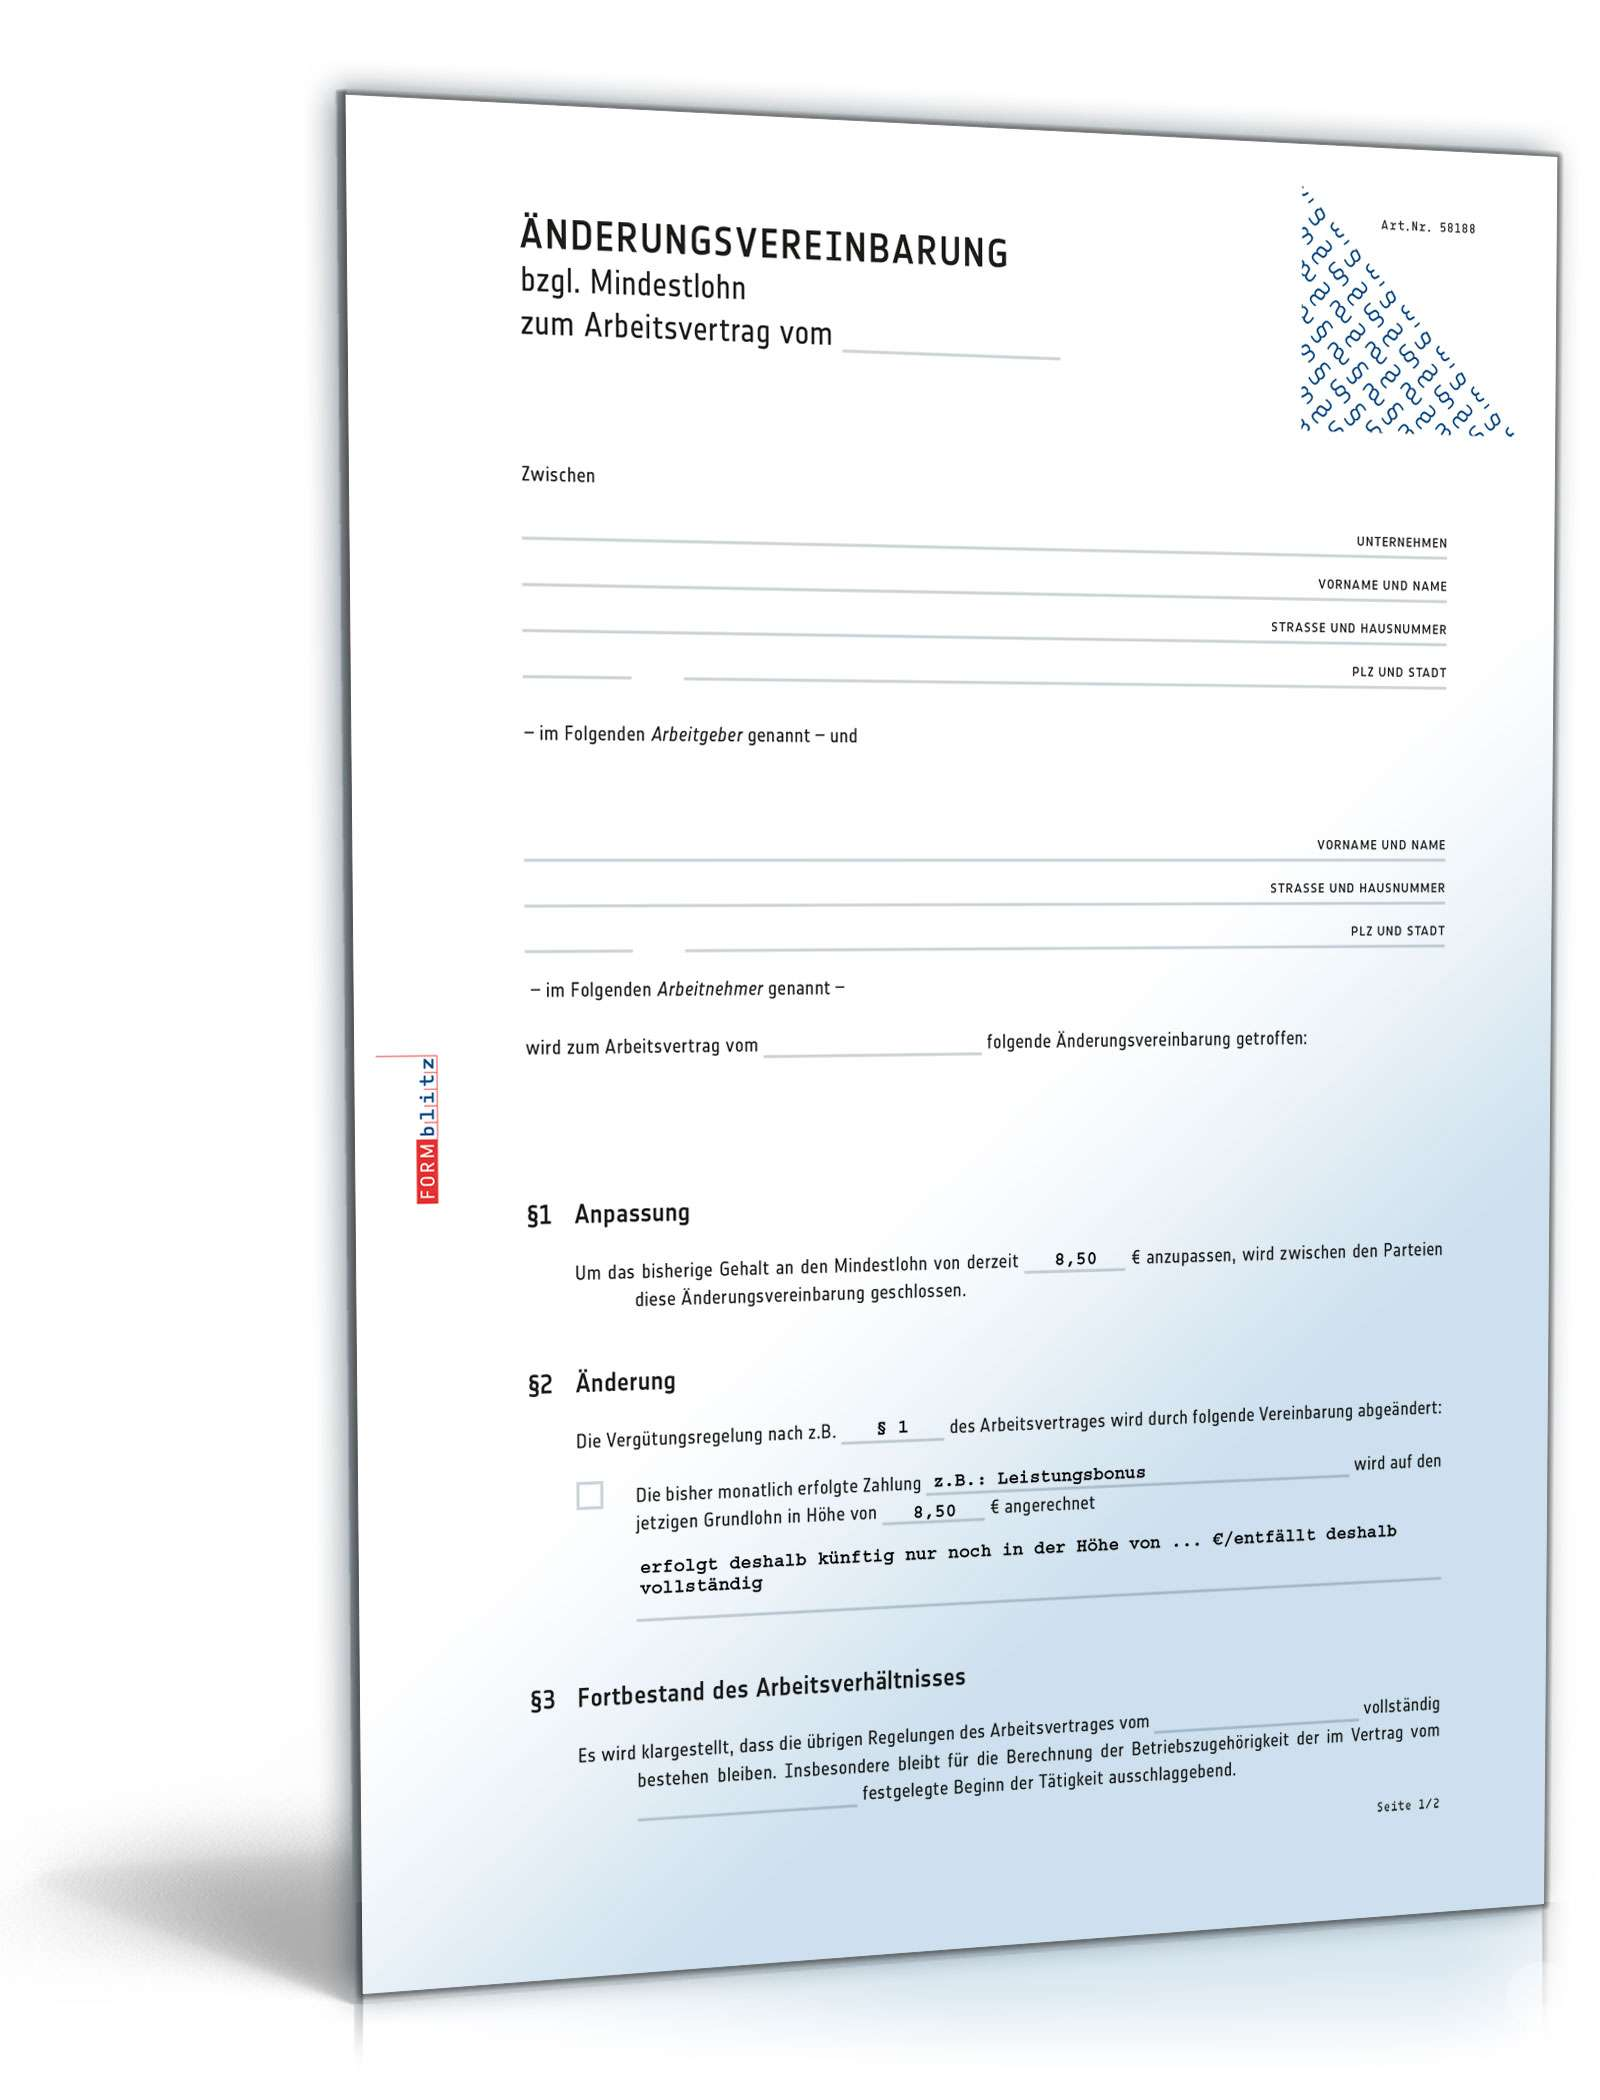 nderungsvereinbarung mindestlohn muster zum download - Anderungsvertrag Muster